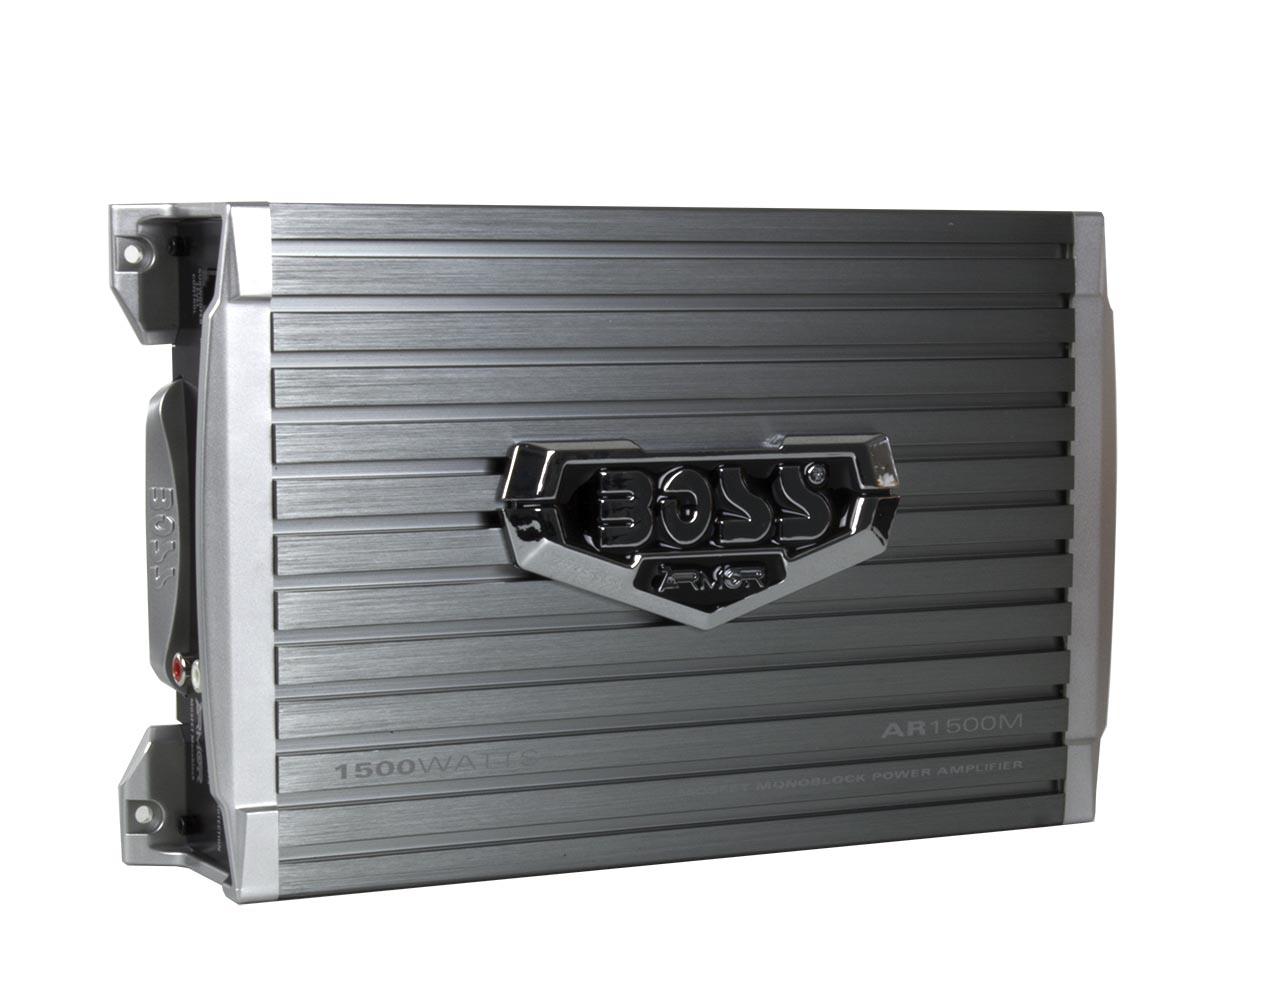 planet audio 1800w subwoofer boss 1500w amplifier w amp kit q power enclosure 842372126274 ebay. Black Bedroom Furniture Sets. Home Design Ideas